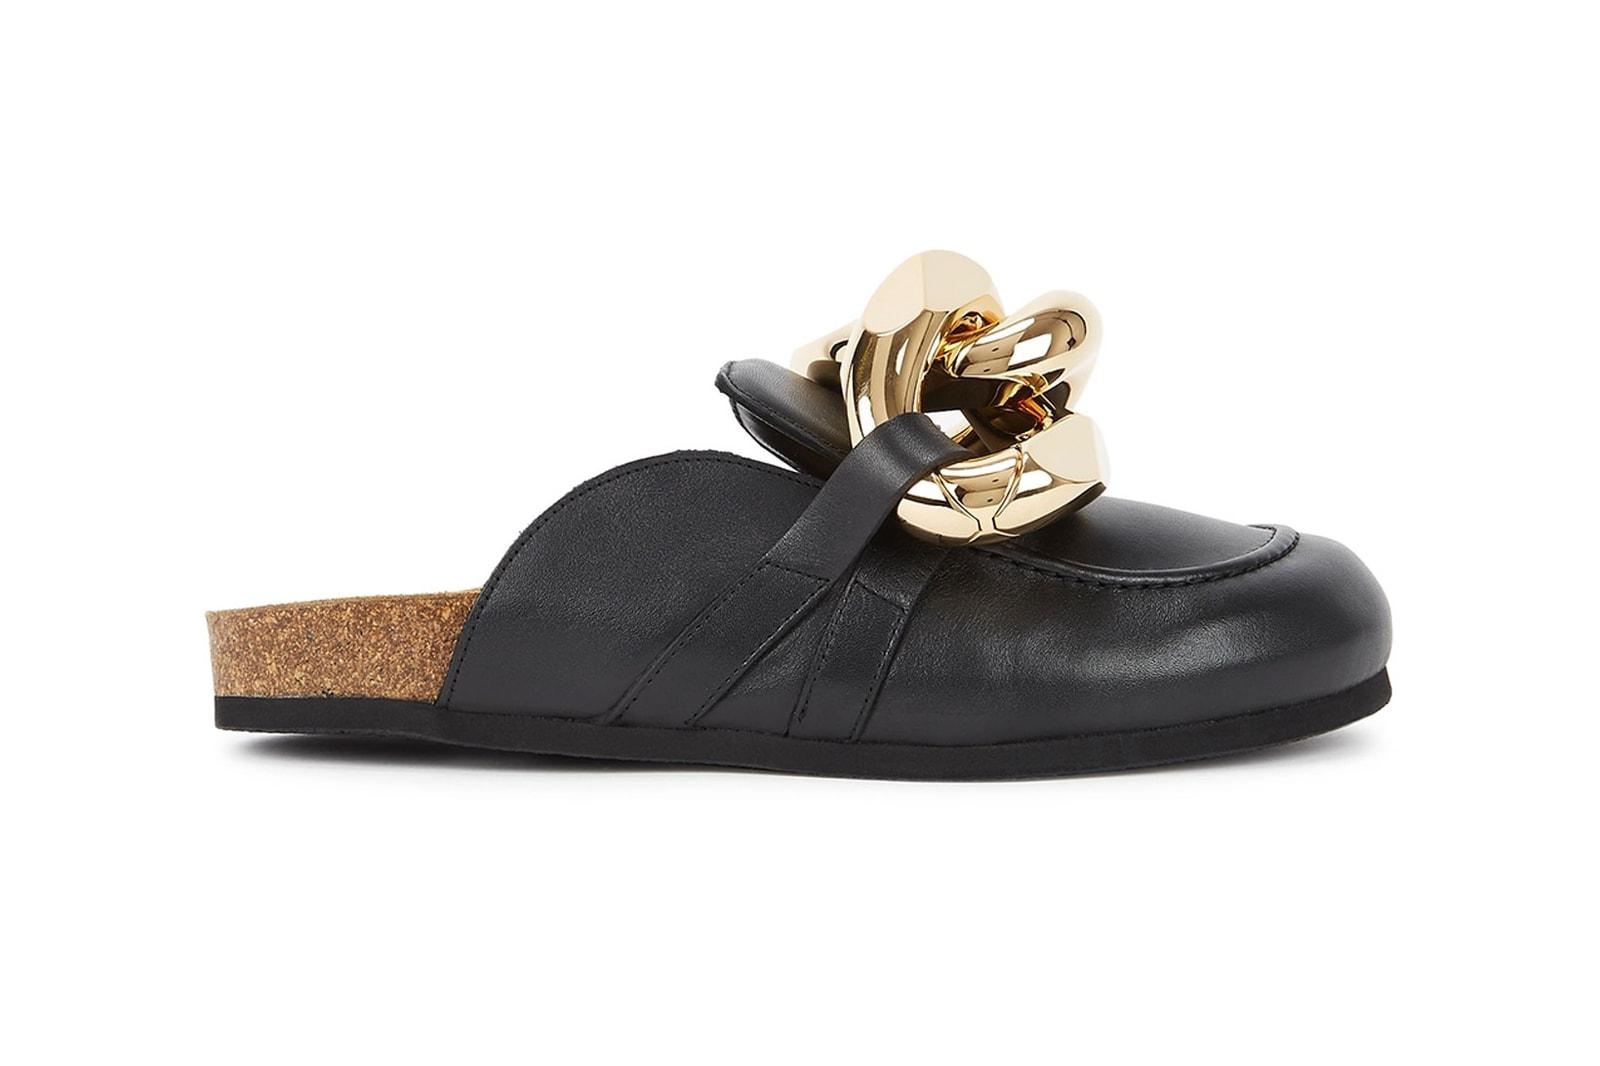 best clogs mules fall winter crocs birkenstock boston sandals adidas danielle cathari sweatpants